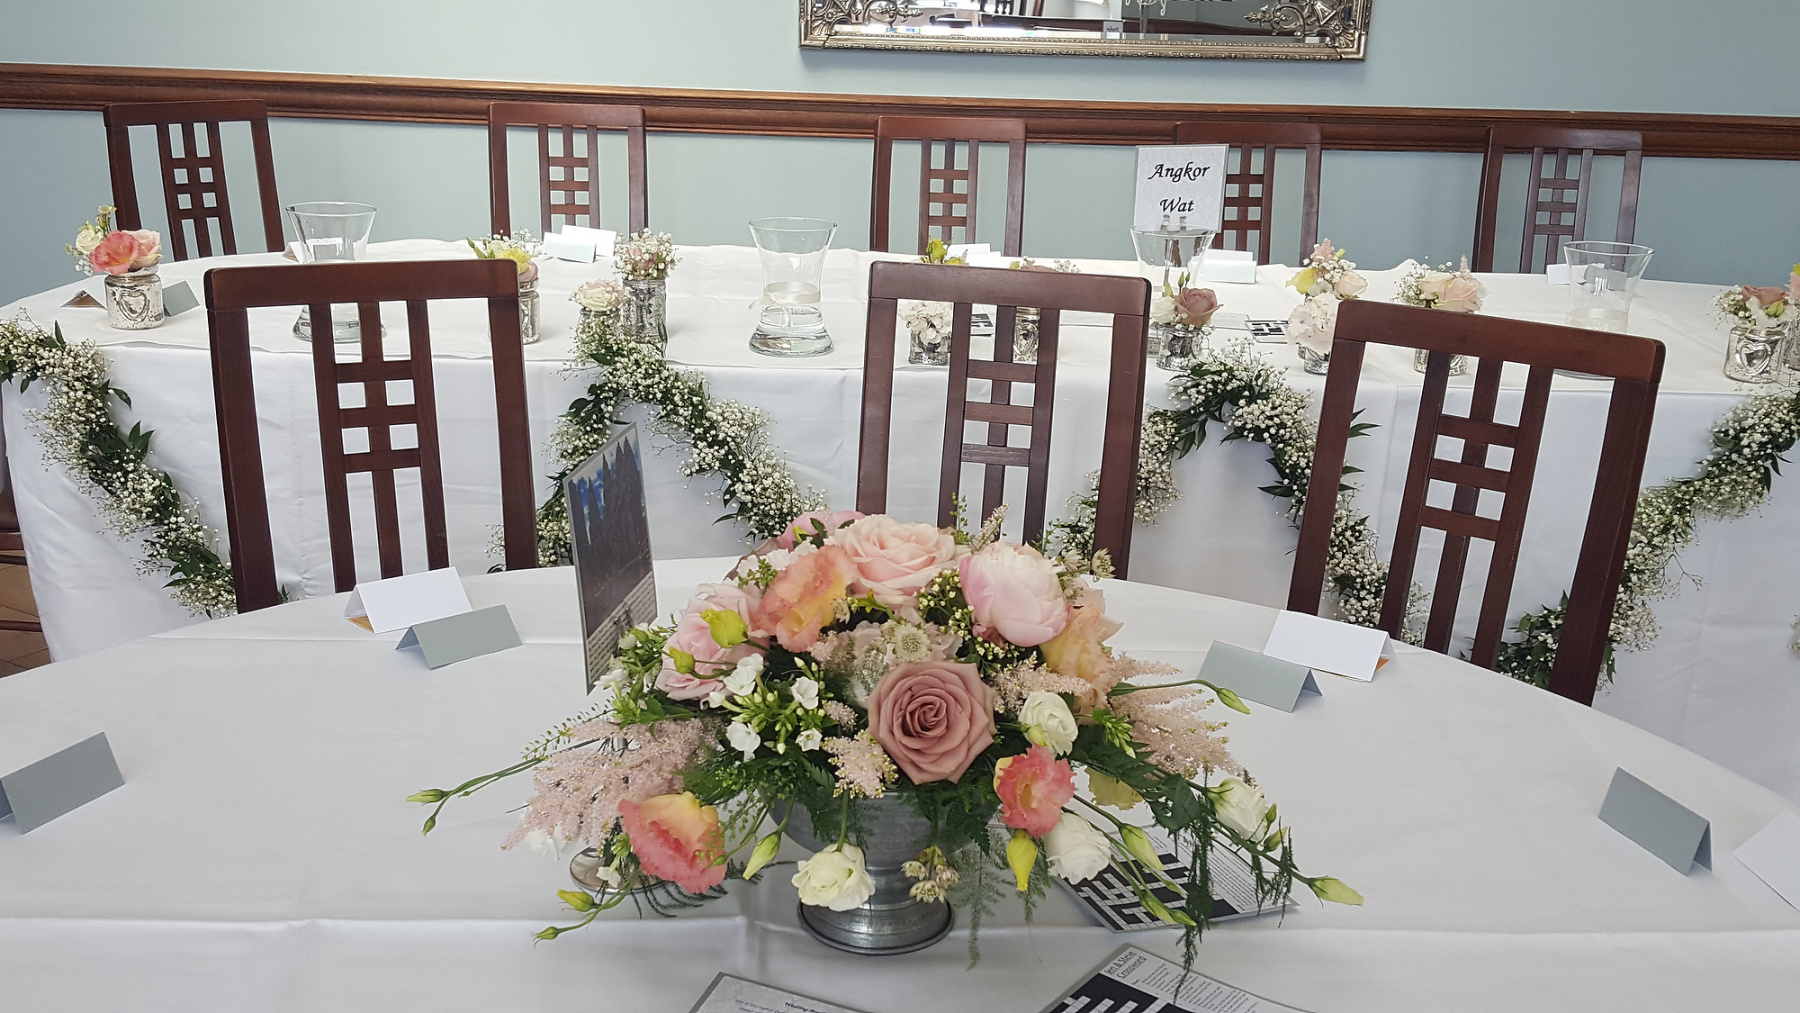 pendrell-hall-wedding-flowers-rugeley-florist-staffordshire-044